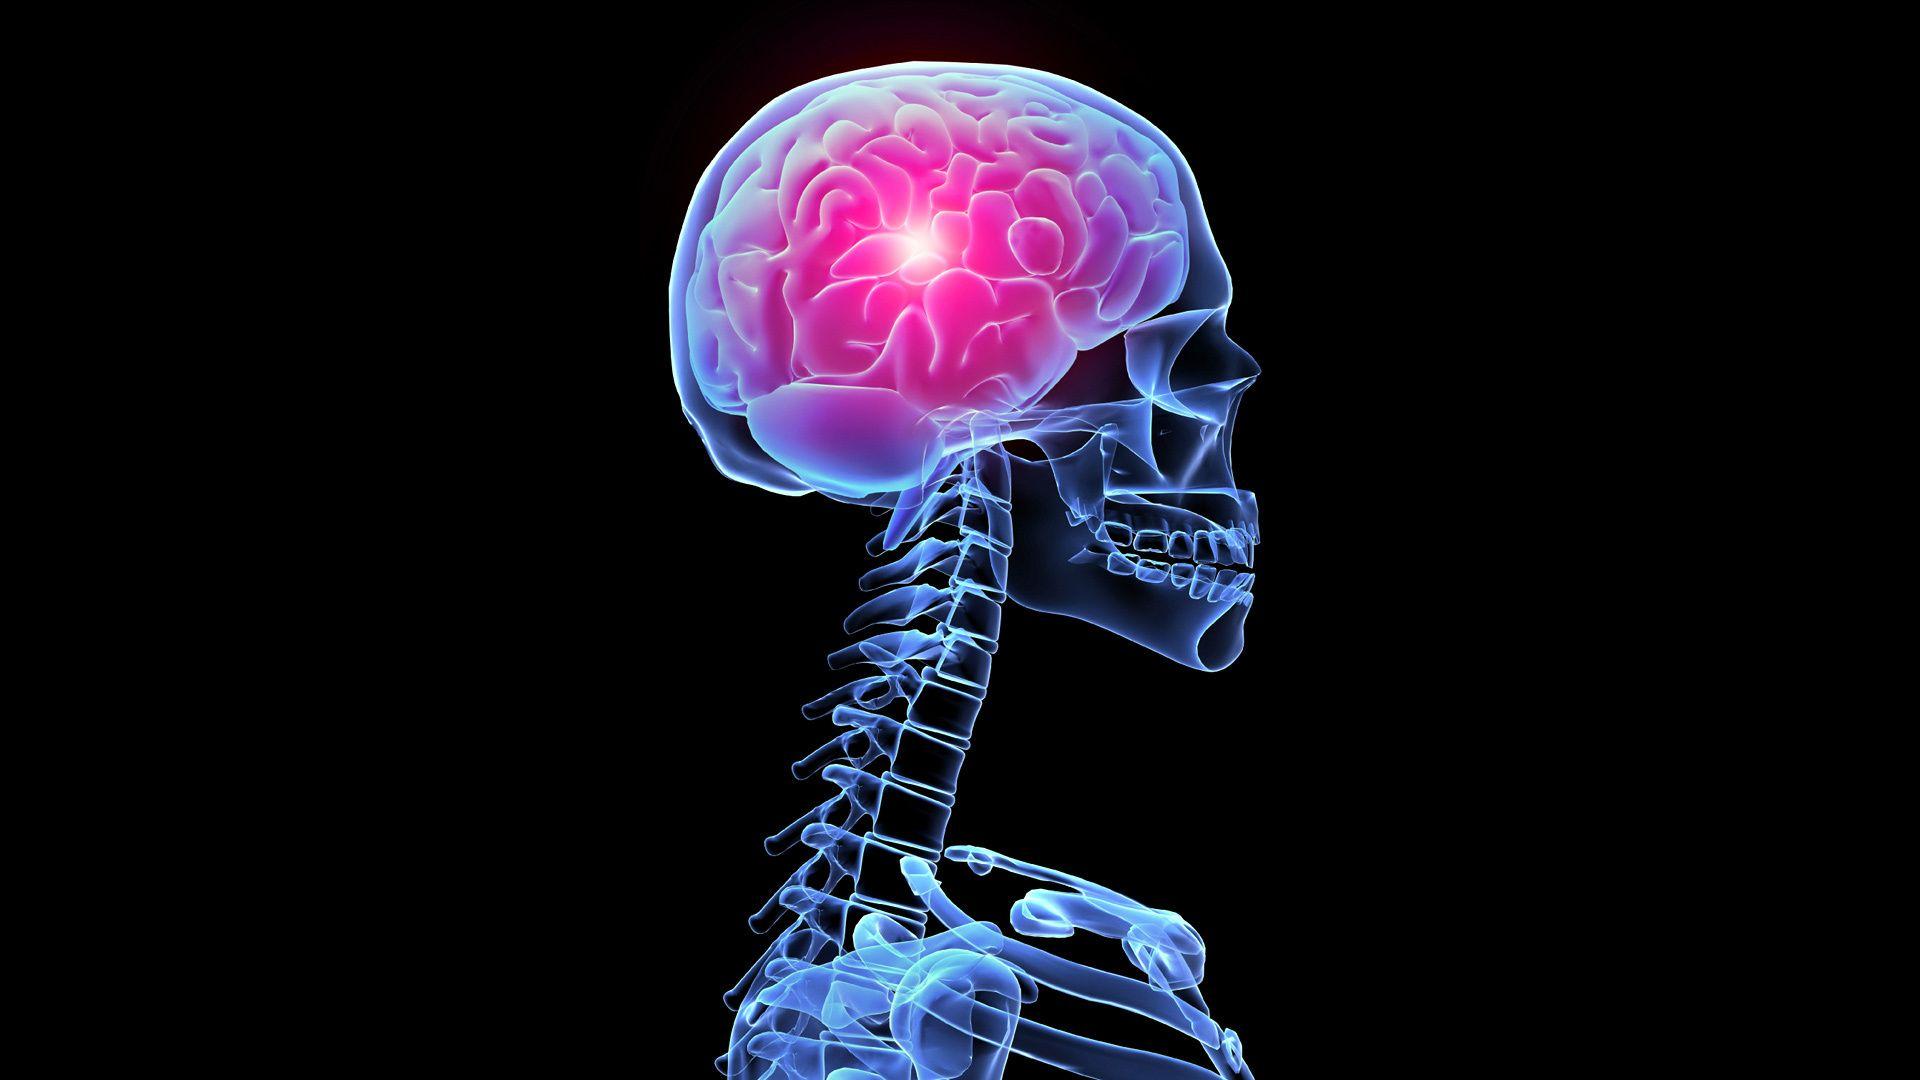 X Rays Of The Brain